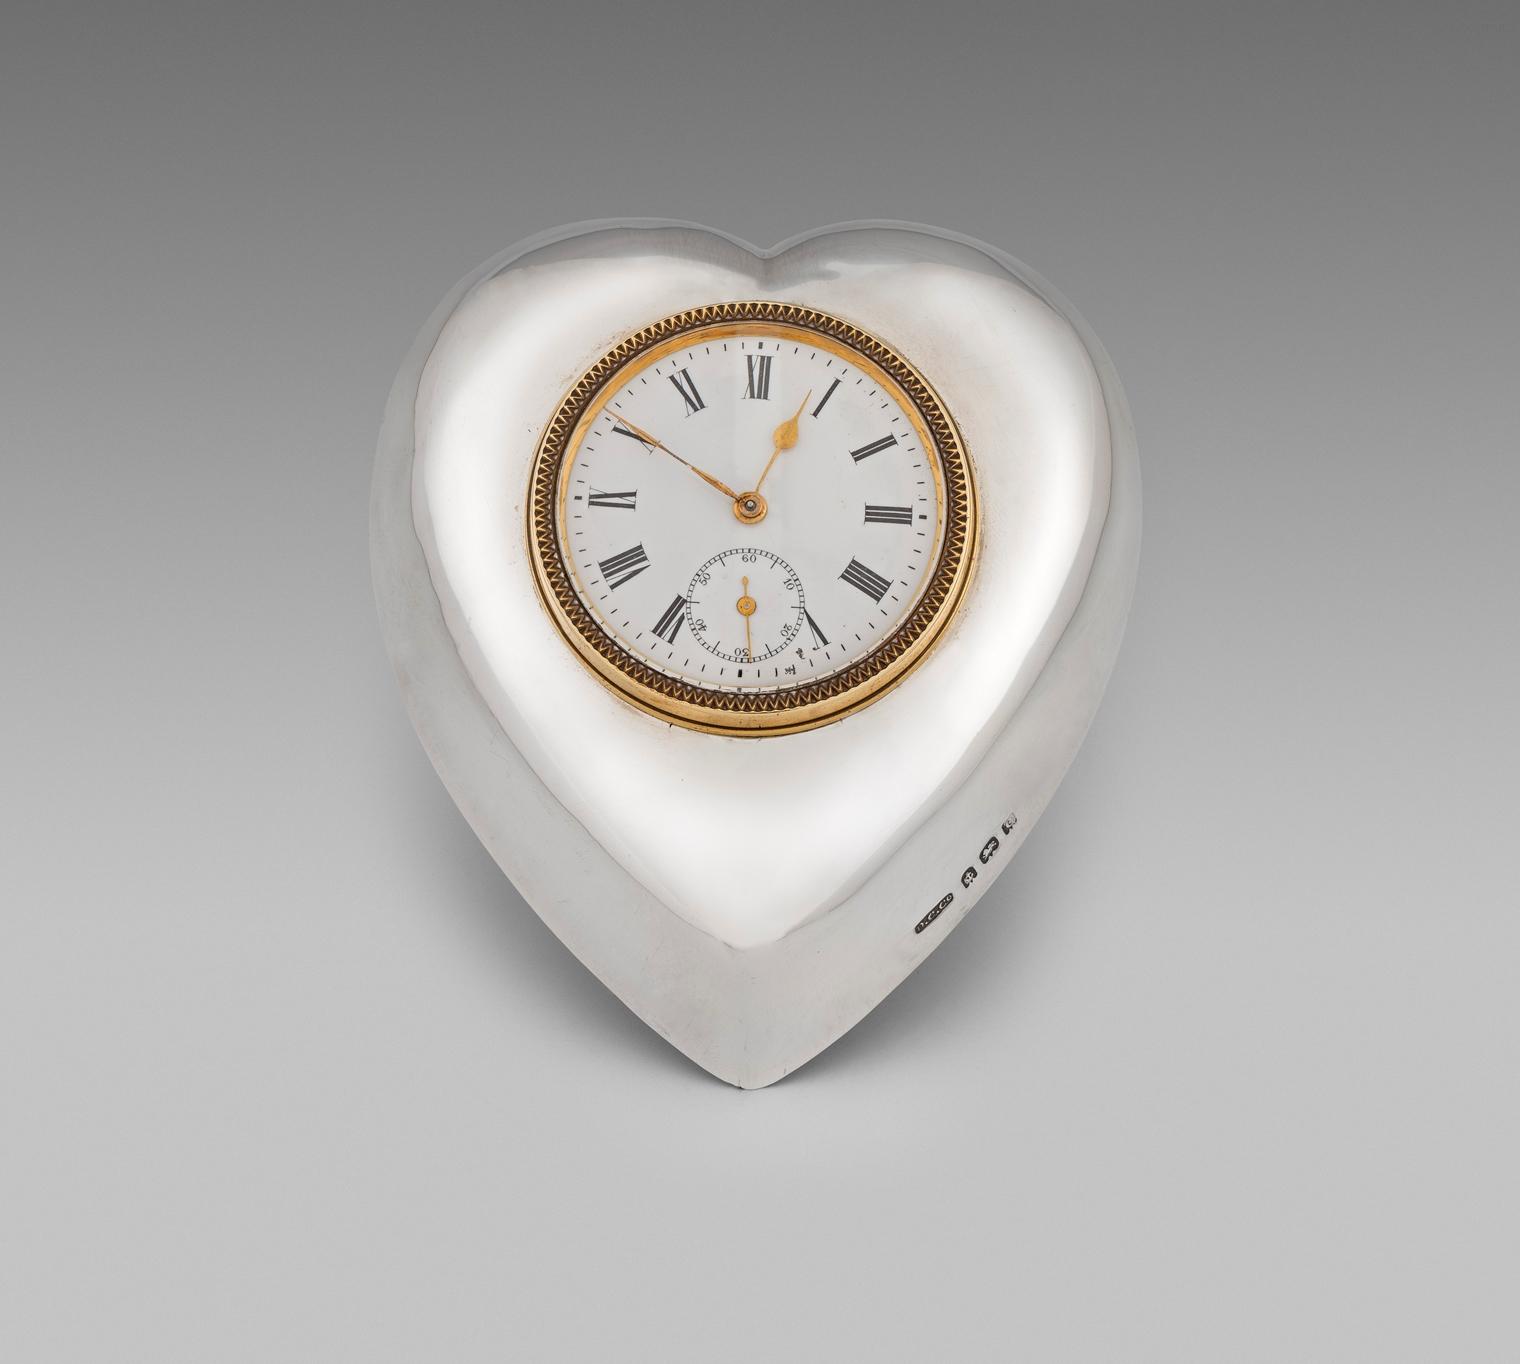 An Edwardian Heart-Shaped Clock